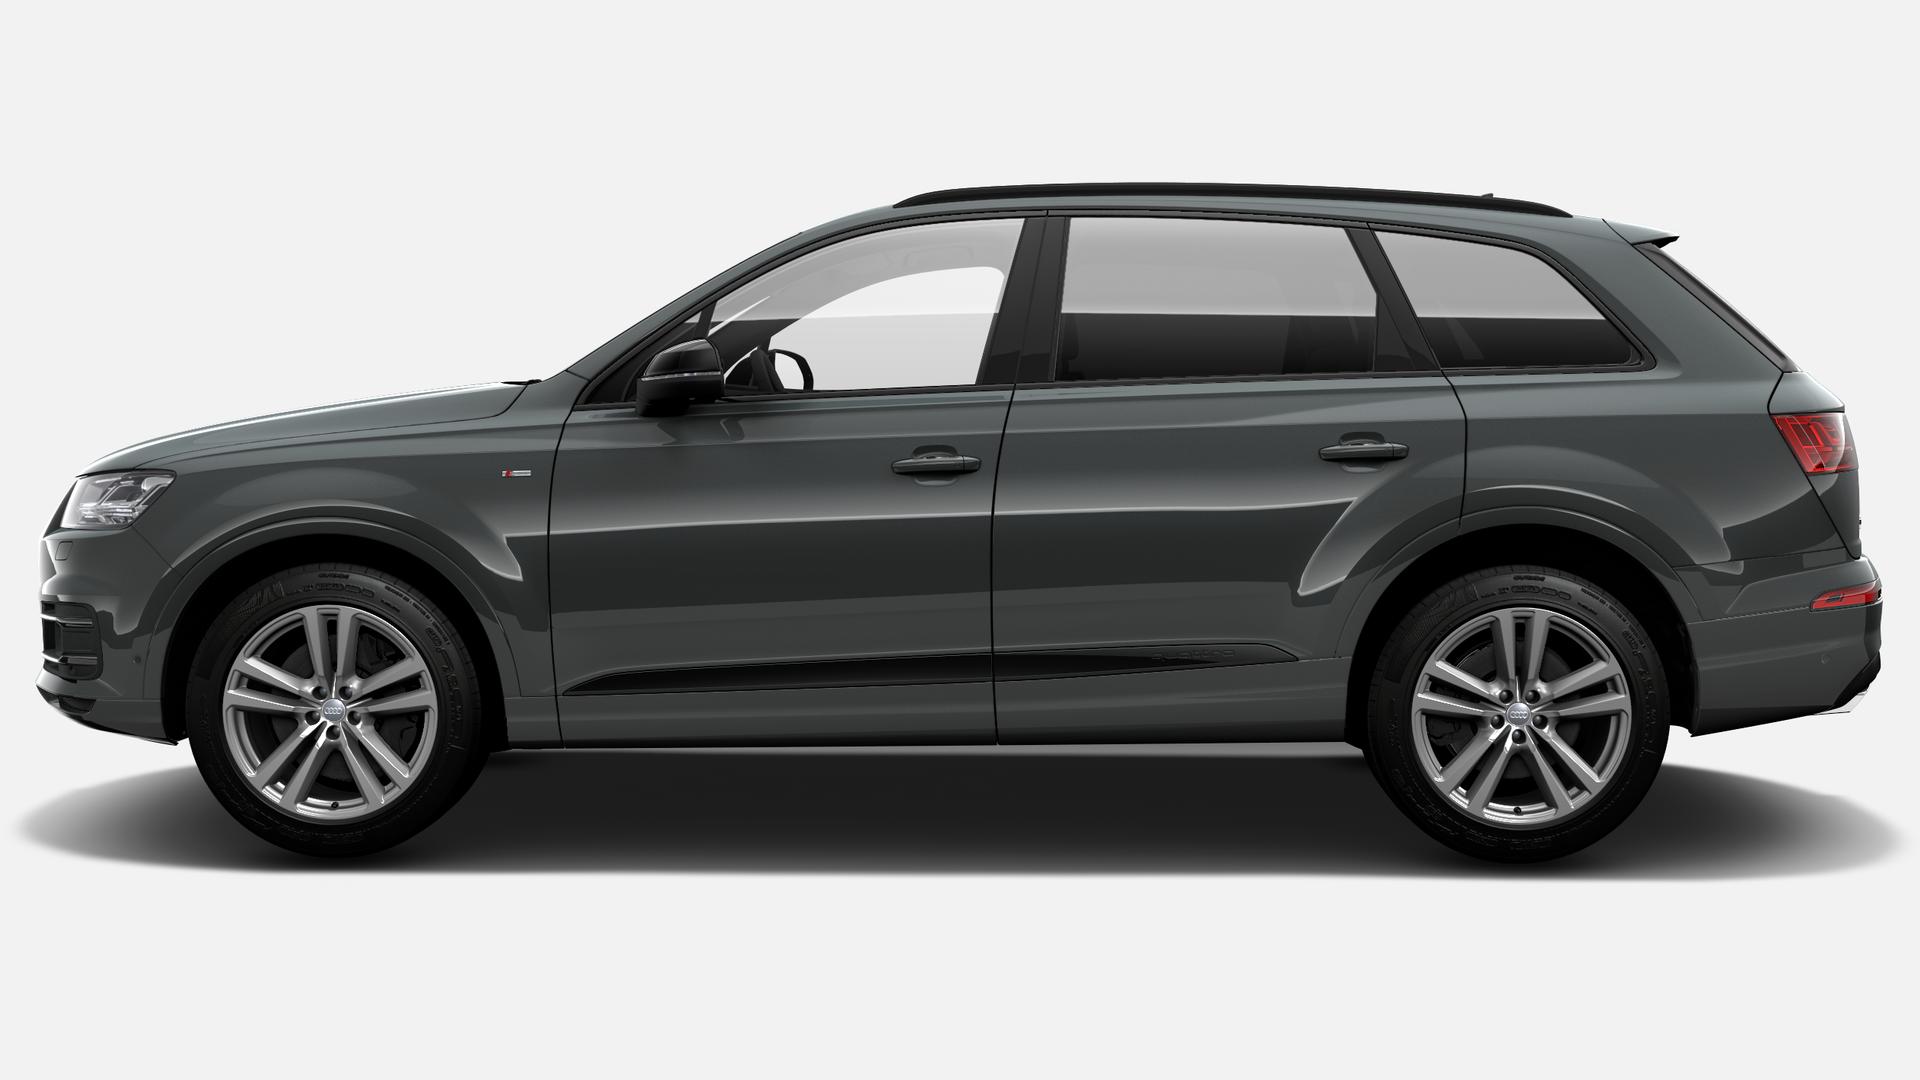 Audi Q7 3.0 TDI Black line edition Quattro Tiptronic 200 kW (272 CV)